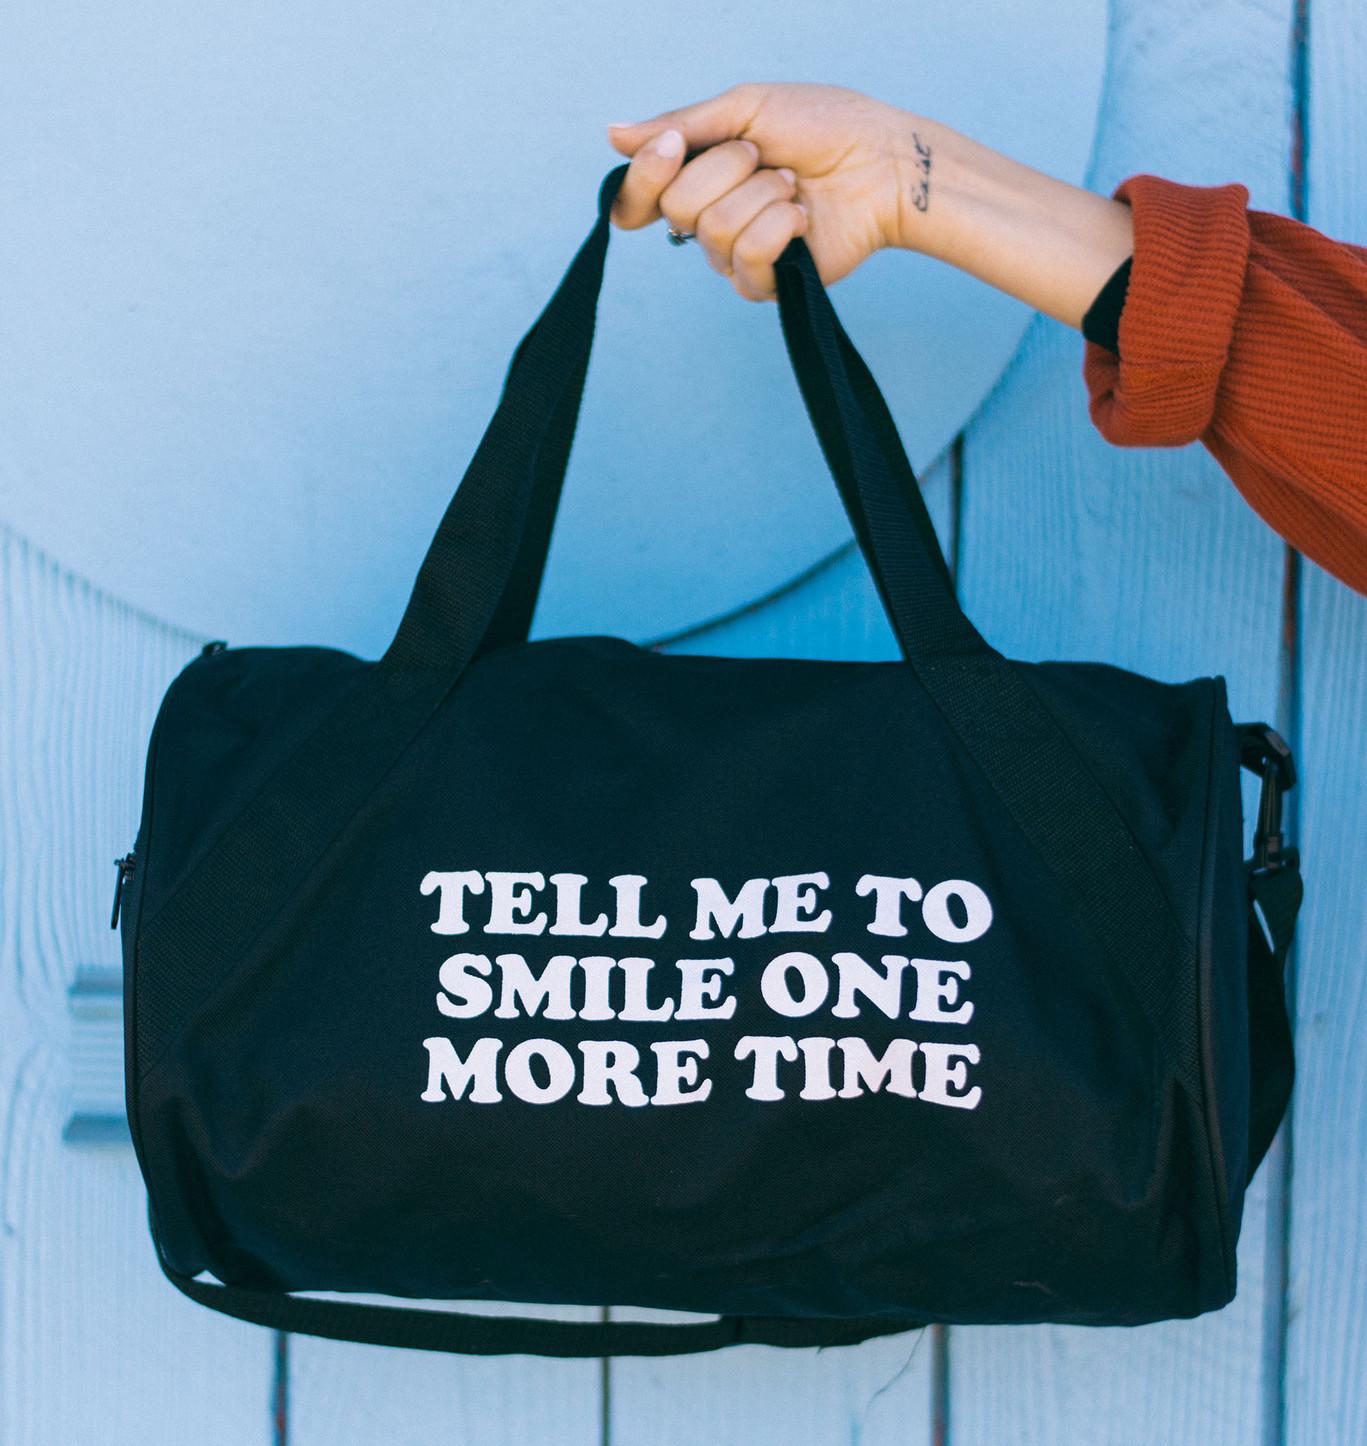 Stylish Gym Bags to Take to Your Next Workout - FabFitFun 5514014a3f97f